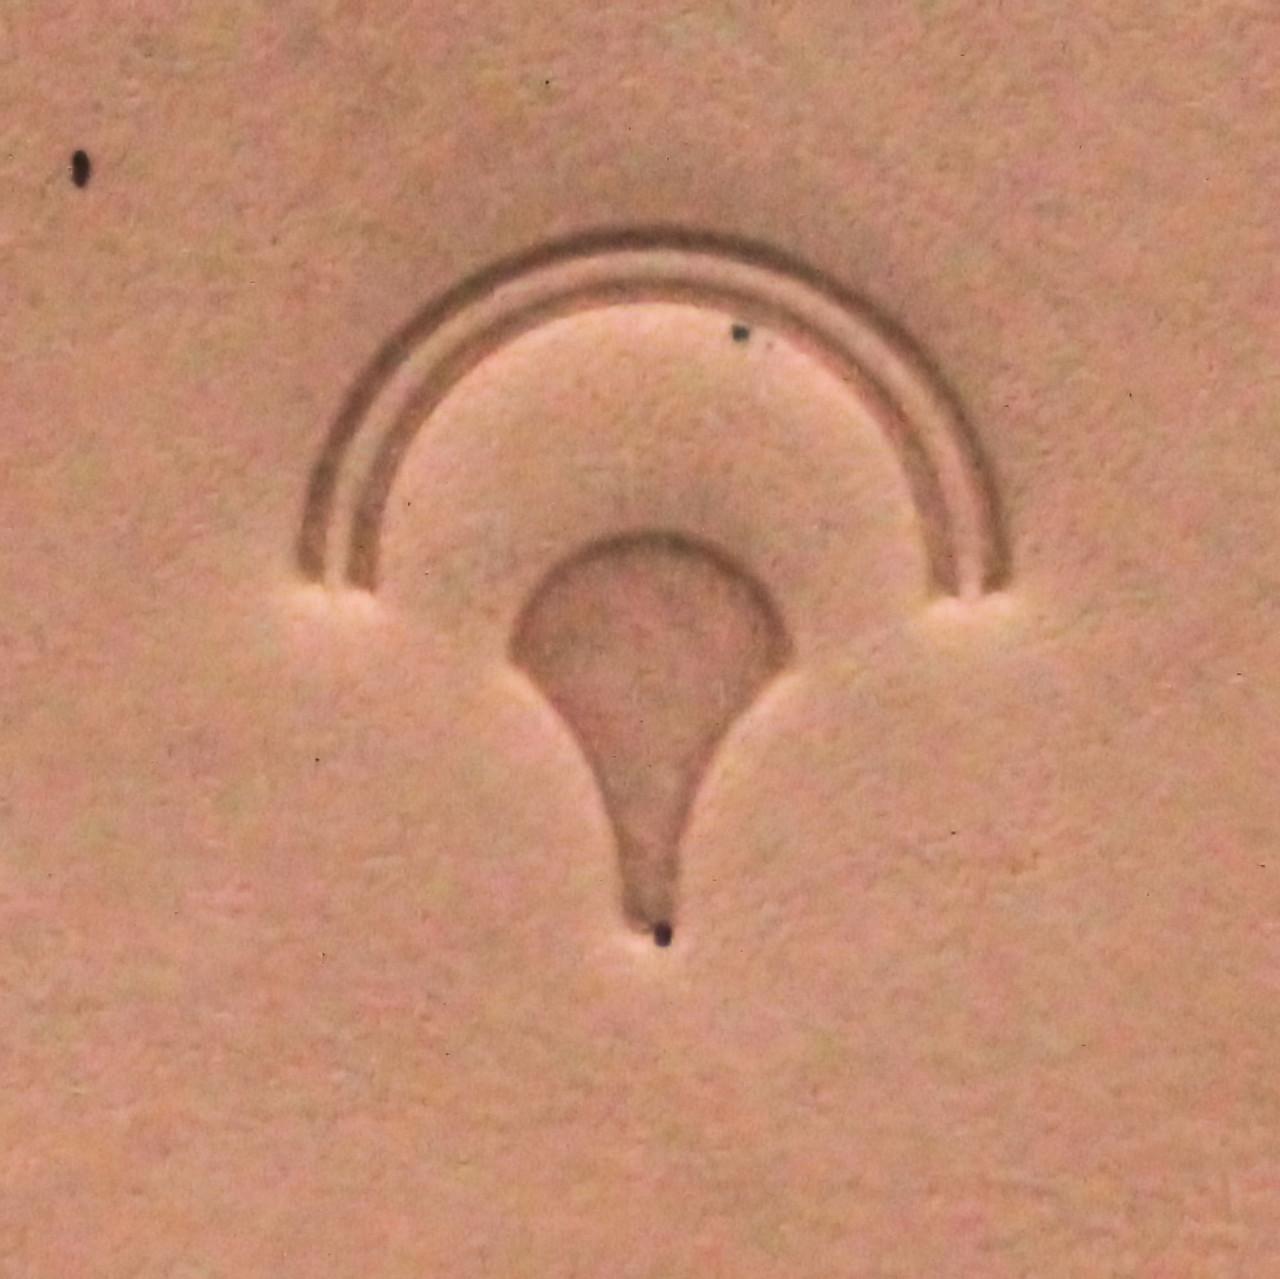 Geometric Leather Stamp G873 Impression